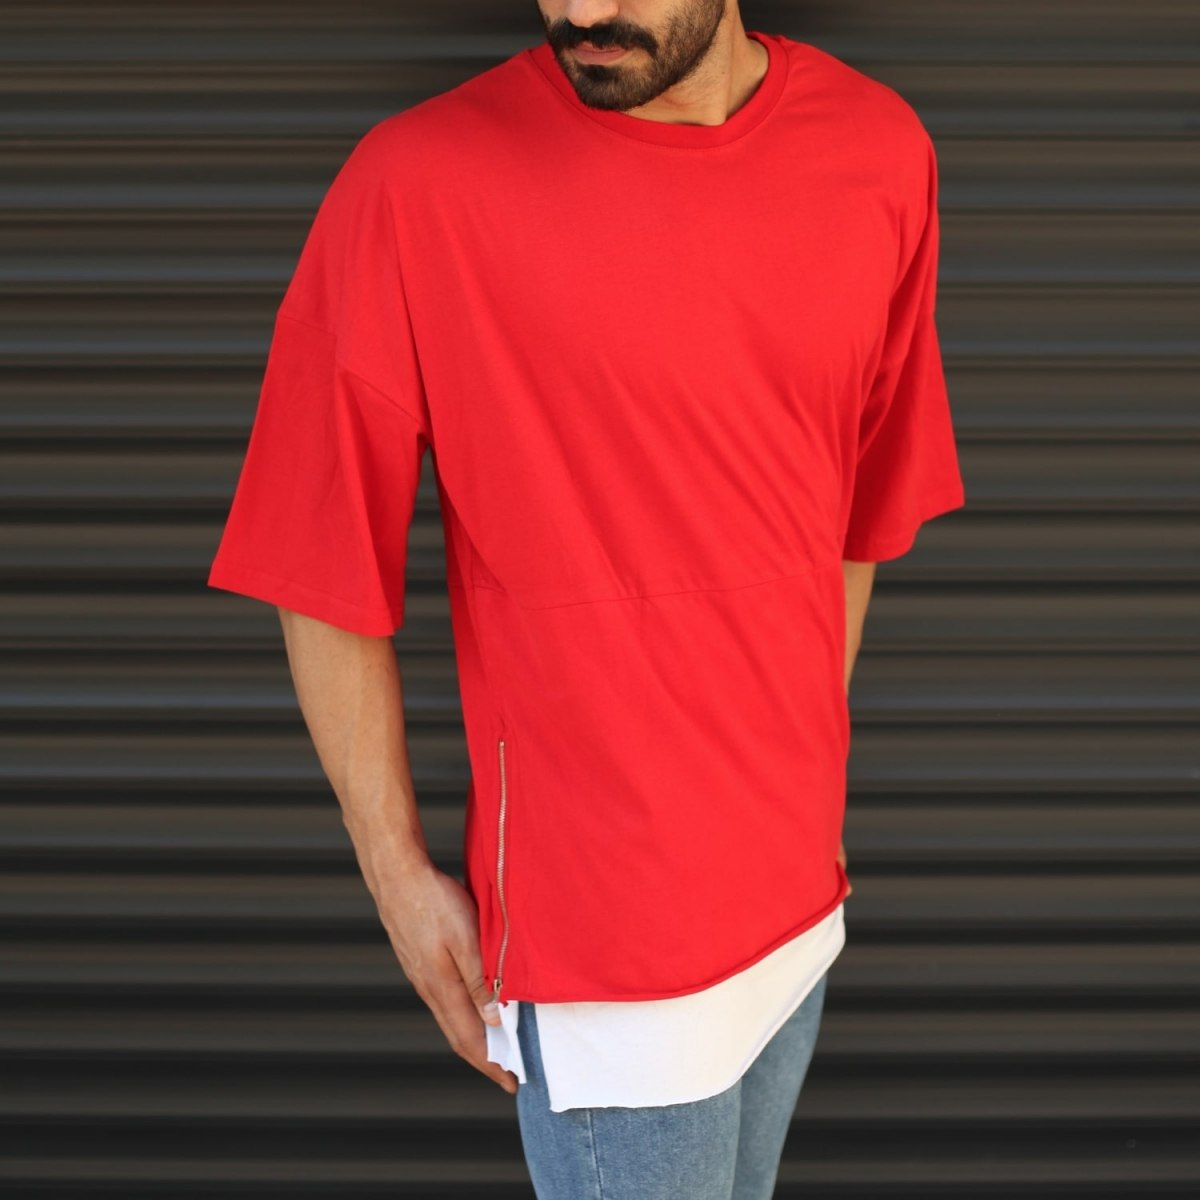 Men's Oversized Round Neck T-Shirt With Zipper Detail Red Mv Premium Brand - 2